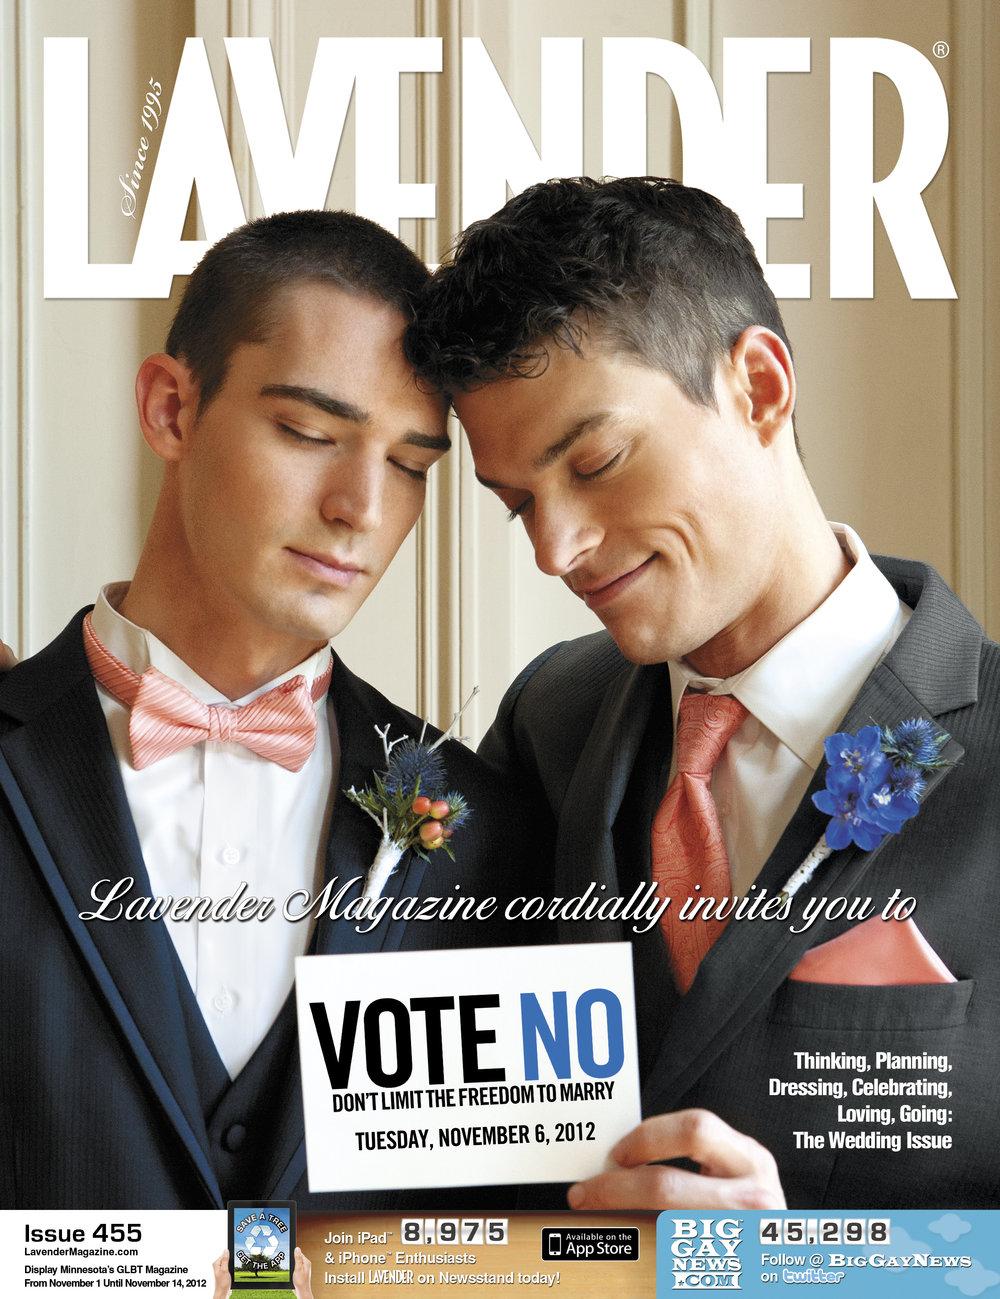 minneapolis-award-winning-hair-and-makeup-lavender-magazine